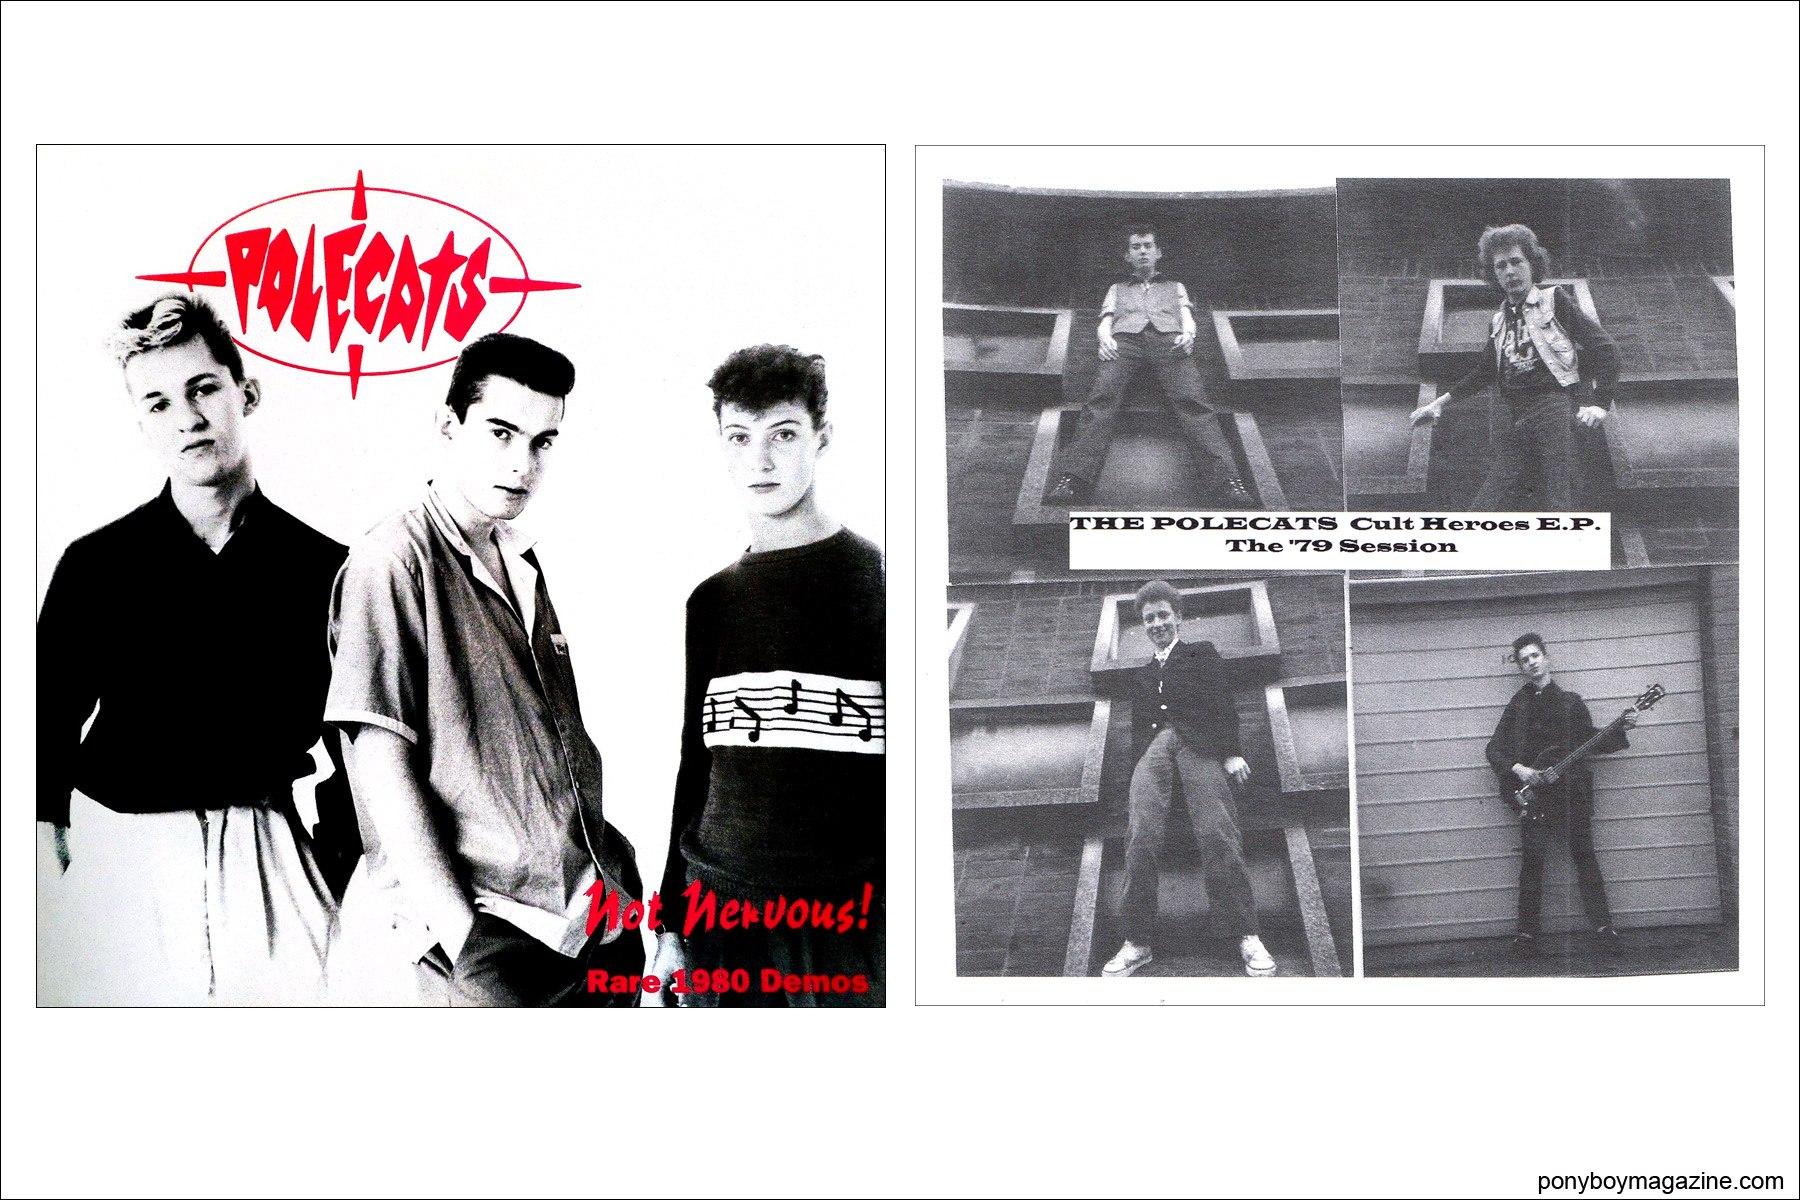 Record covers for UK neo-rockabilly sensation Polecats. Ponyboy Magazine NY.